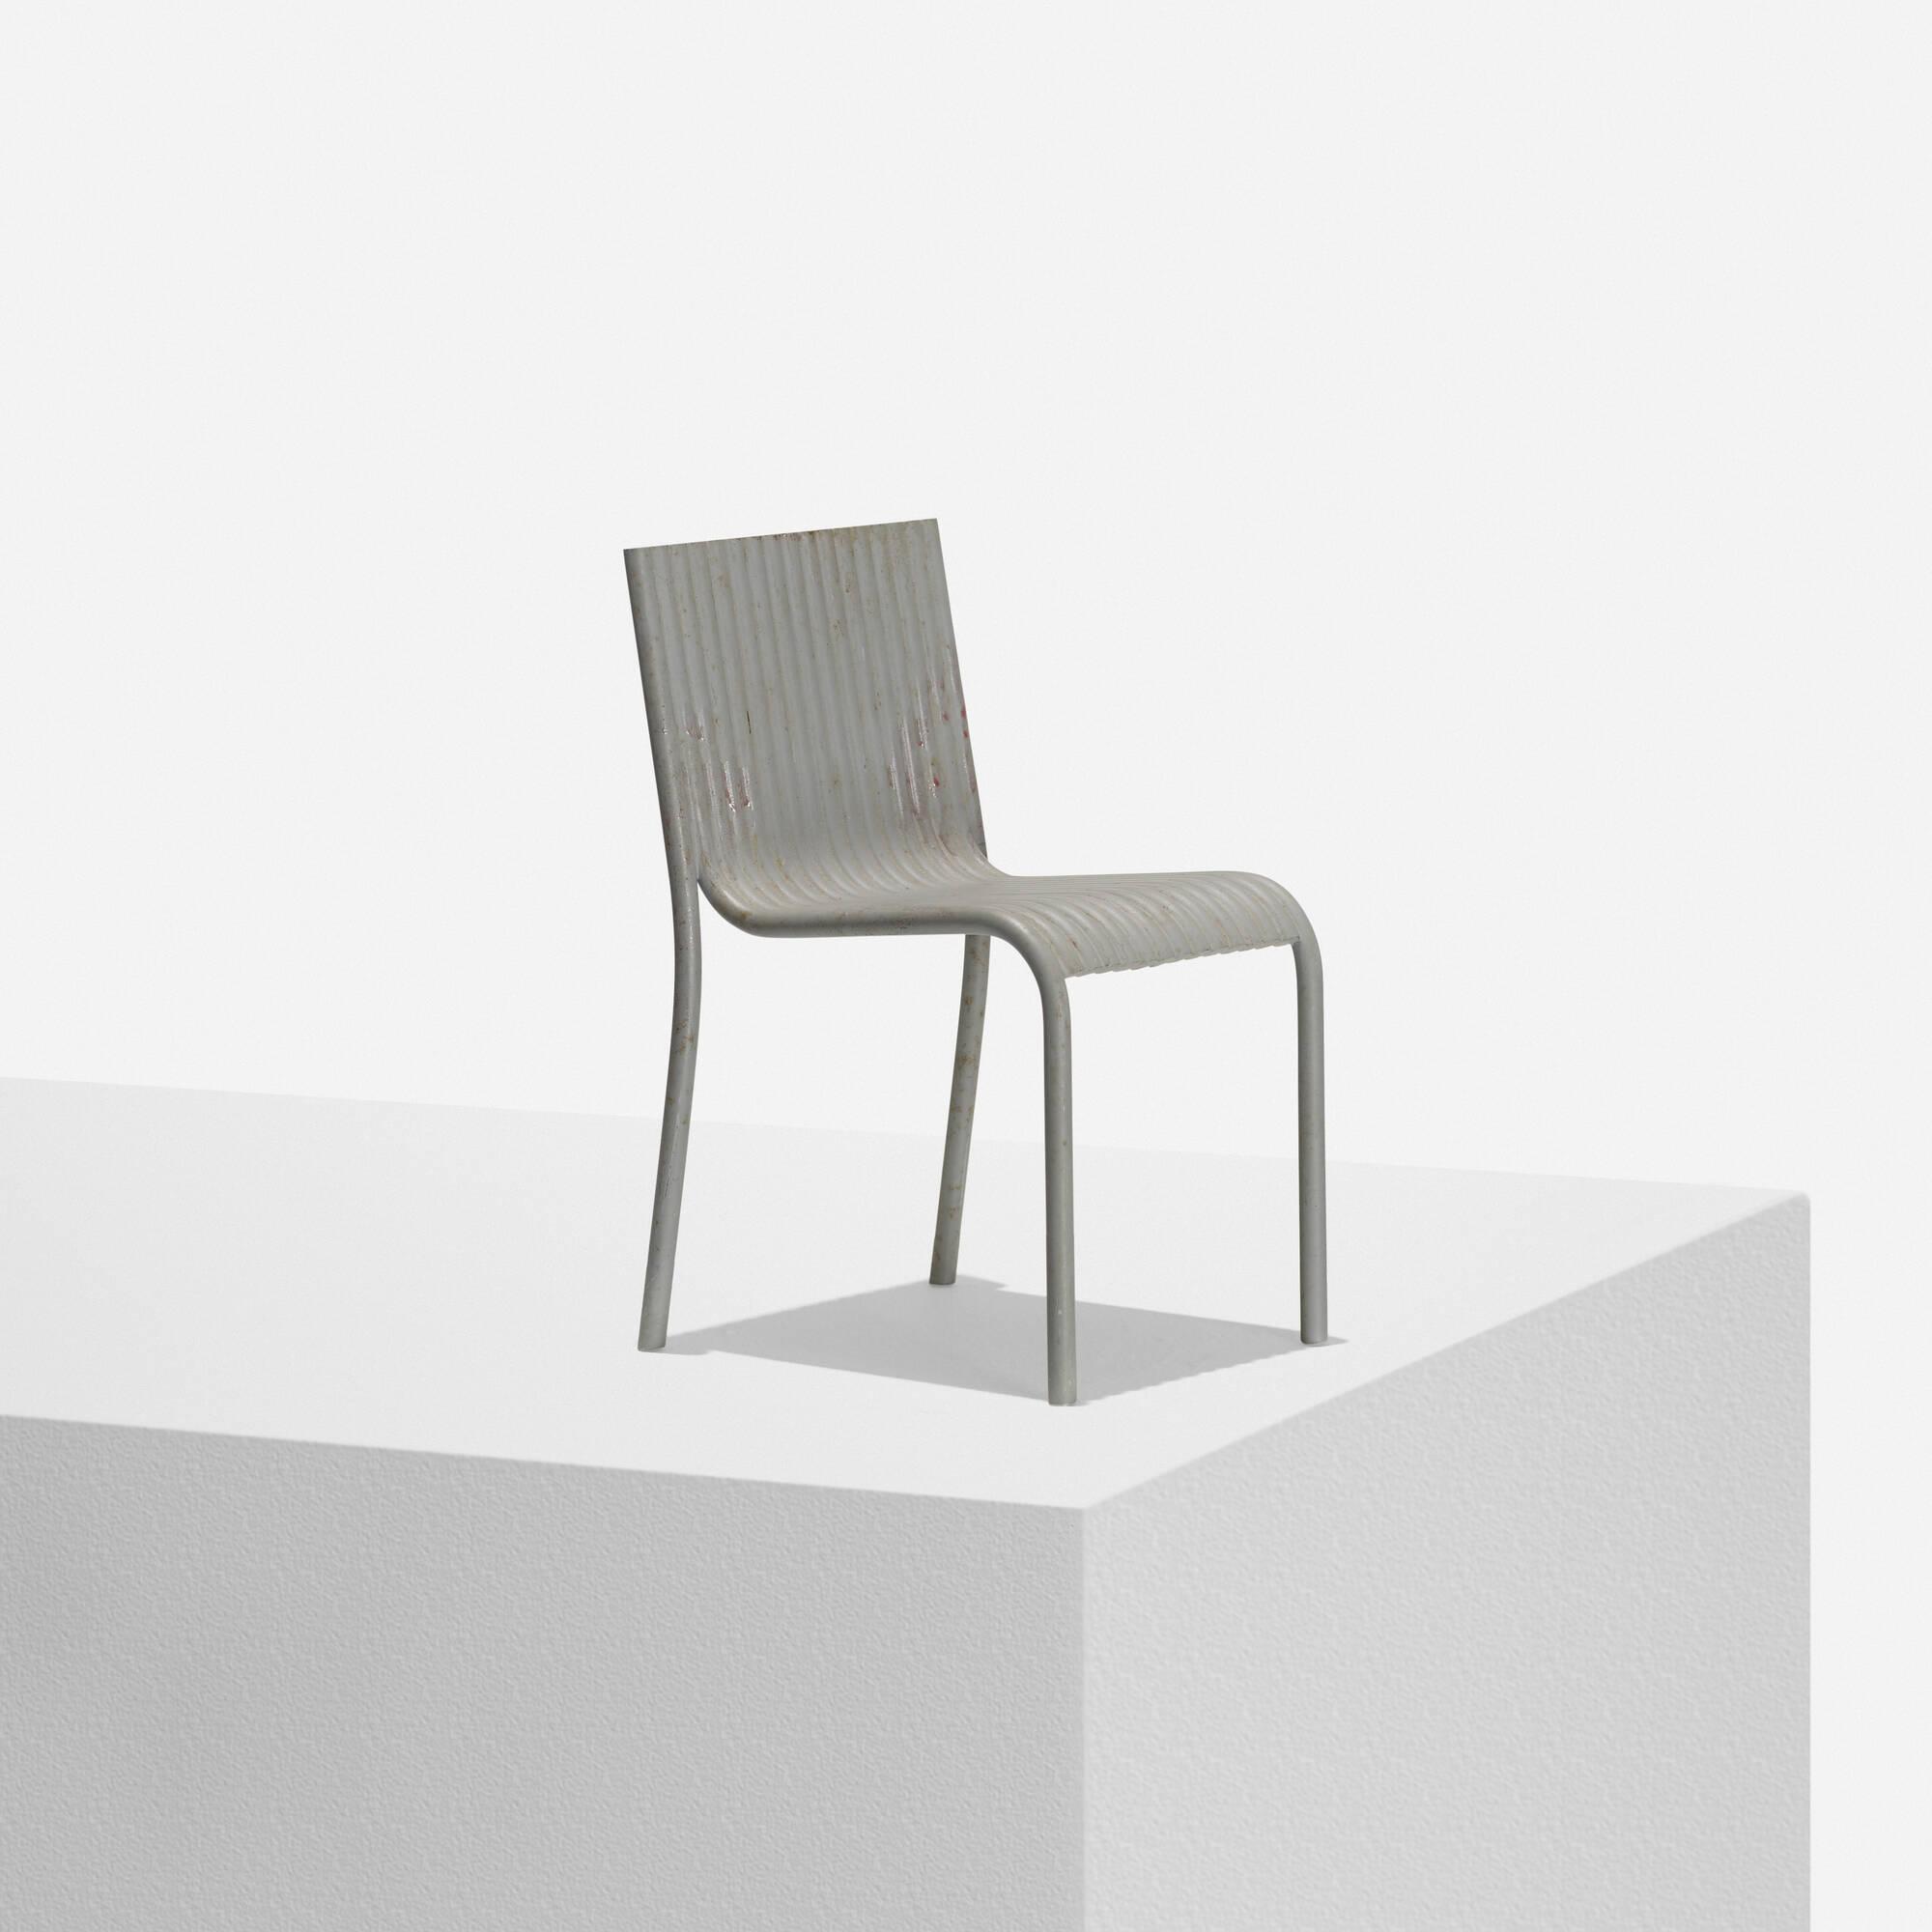 134: Richard Schultz / Model For Tubular Chair (1 Of 1)